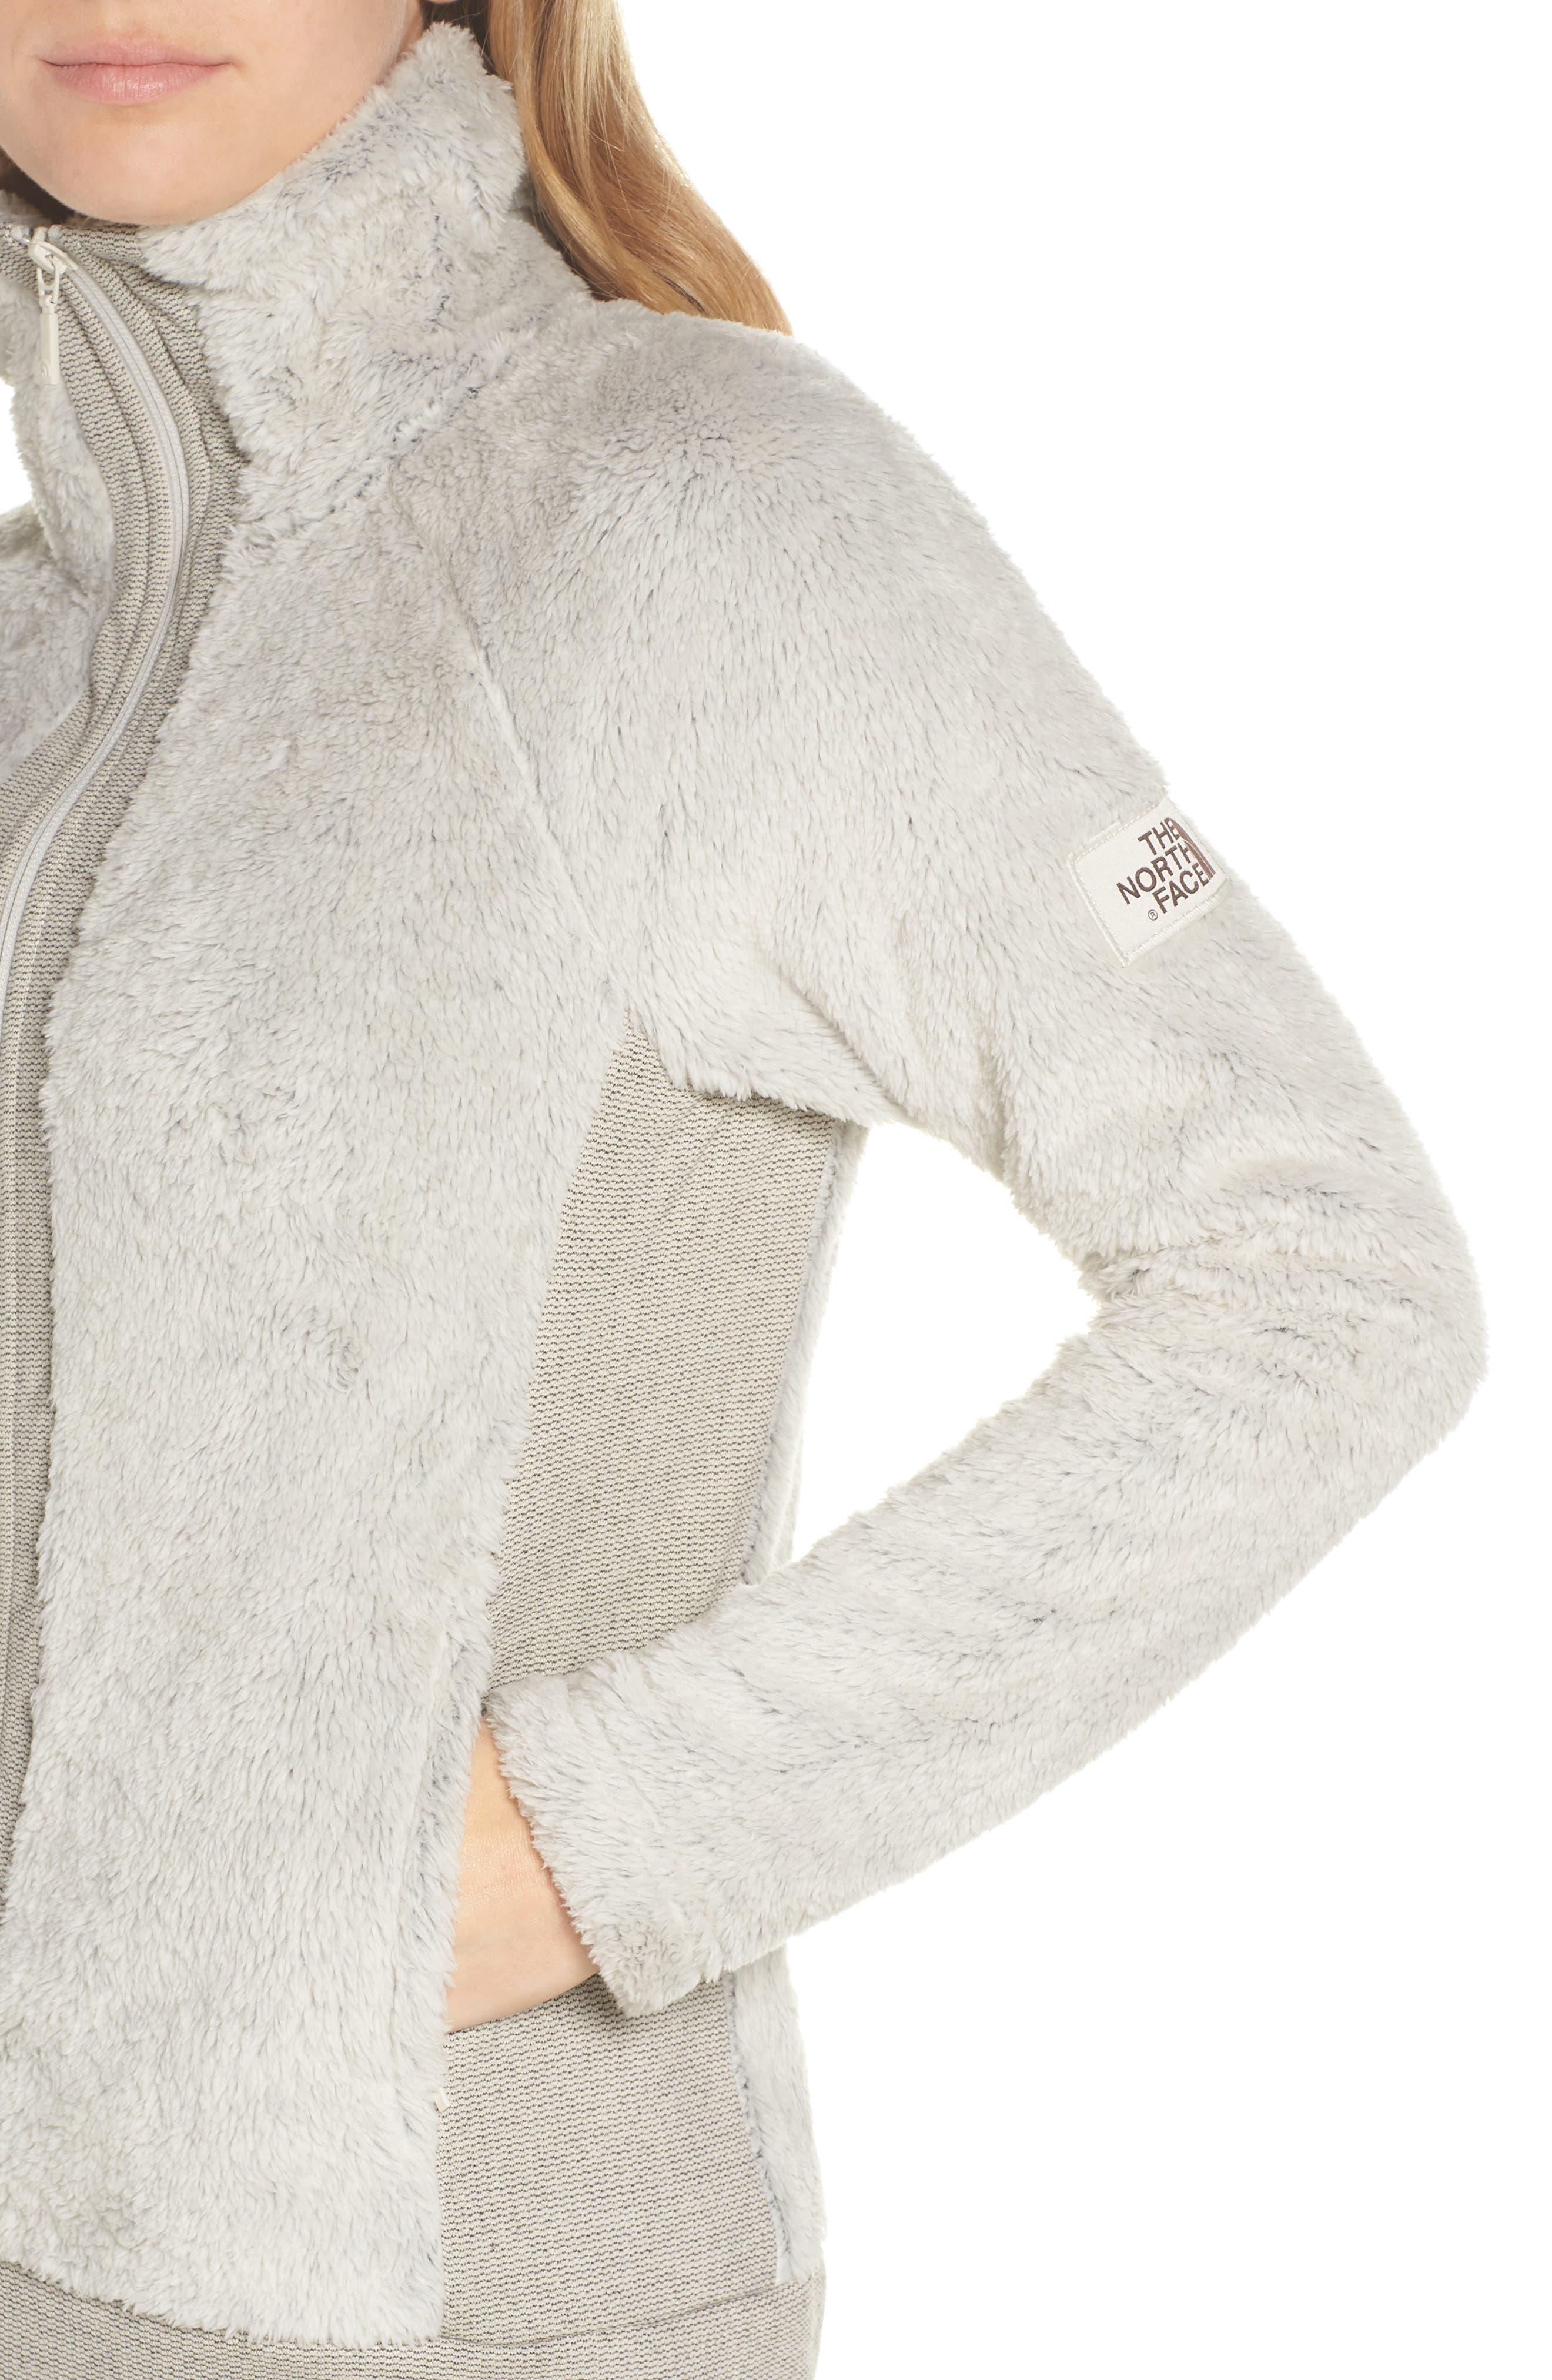 THE NORTH FACE, Furry Fleece Jacket, Alternate thumbnail 5, color, VINTAGE WHITE